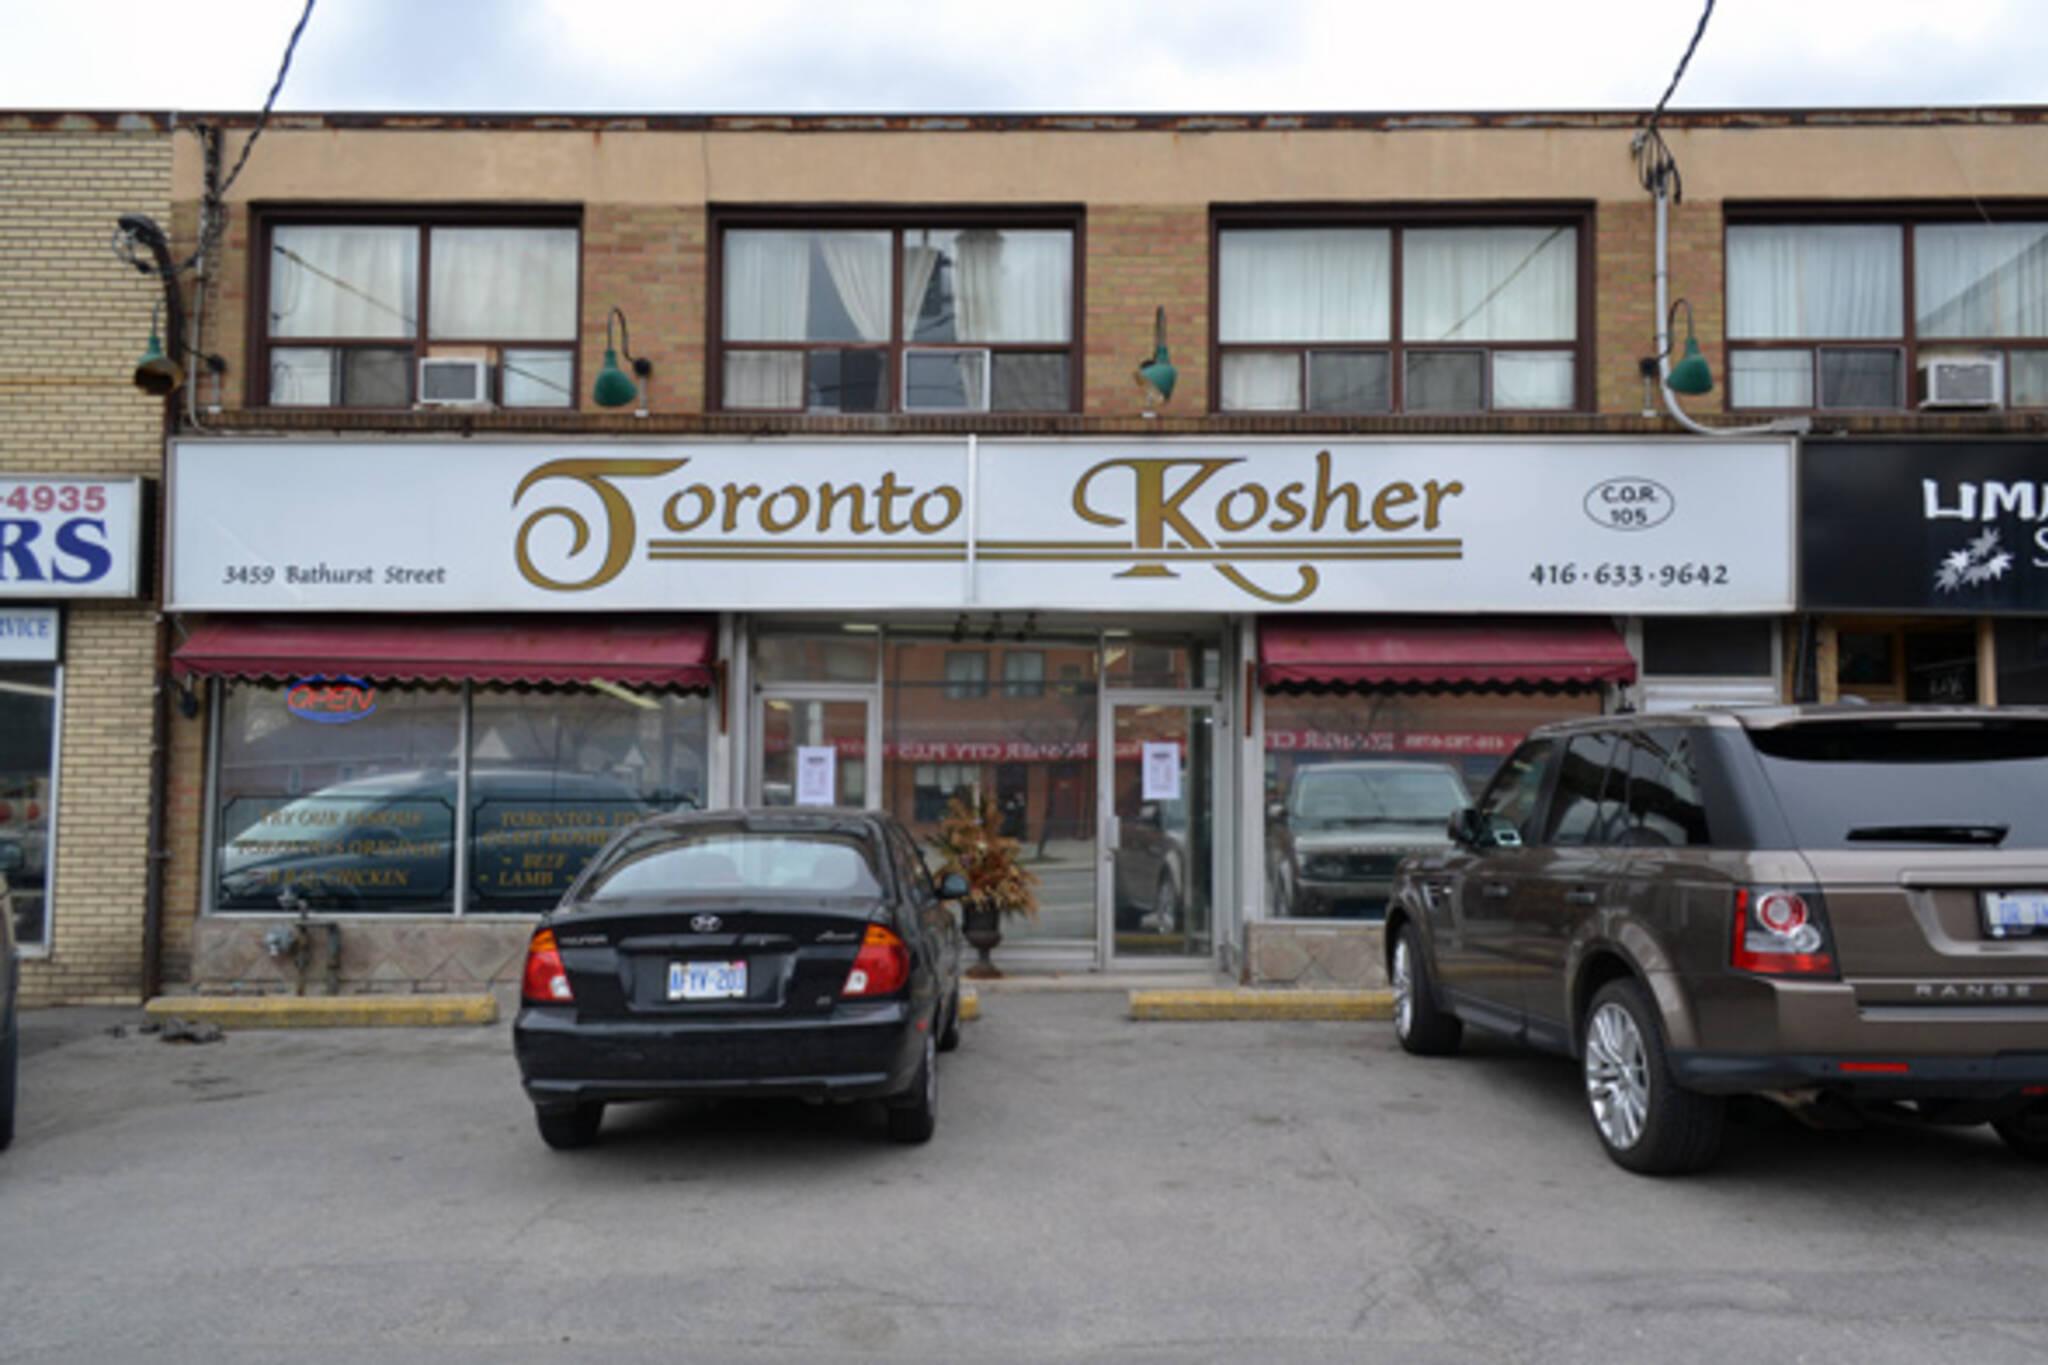 Toronto Kosher